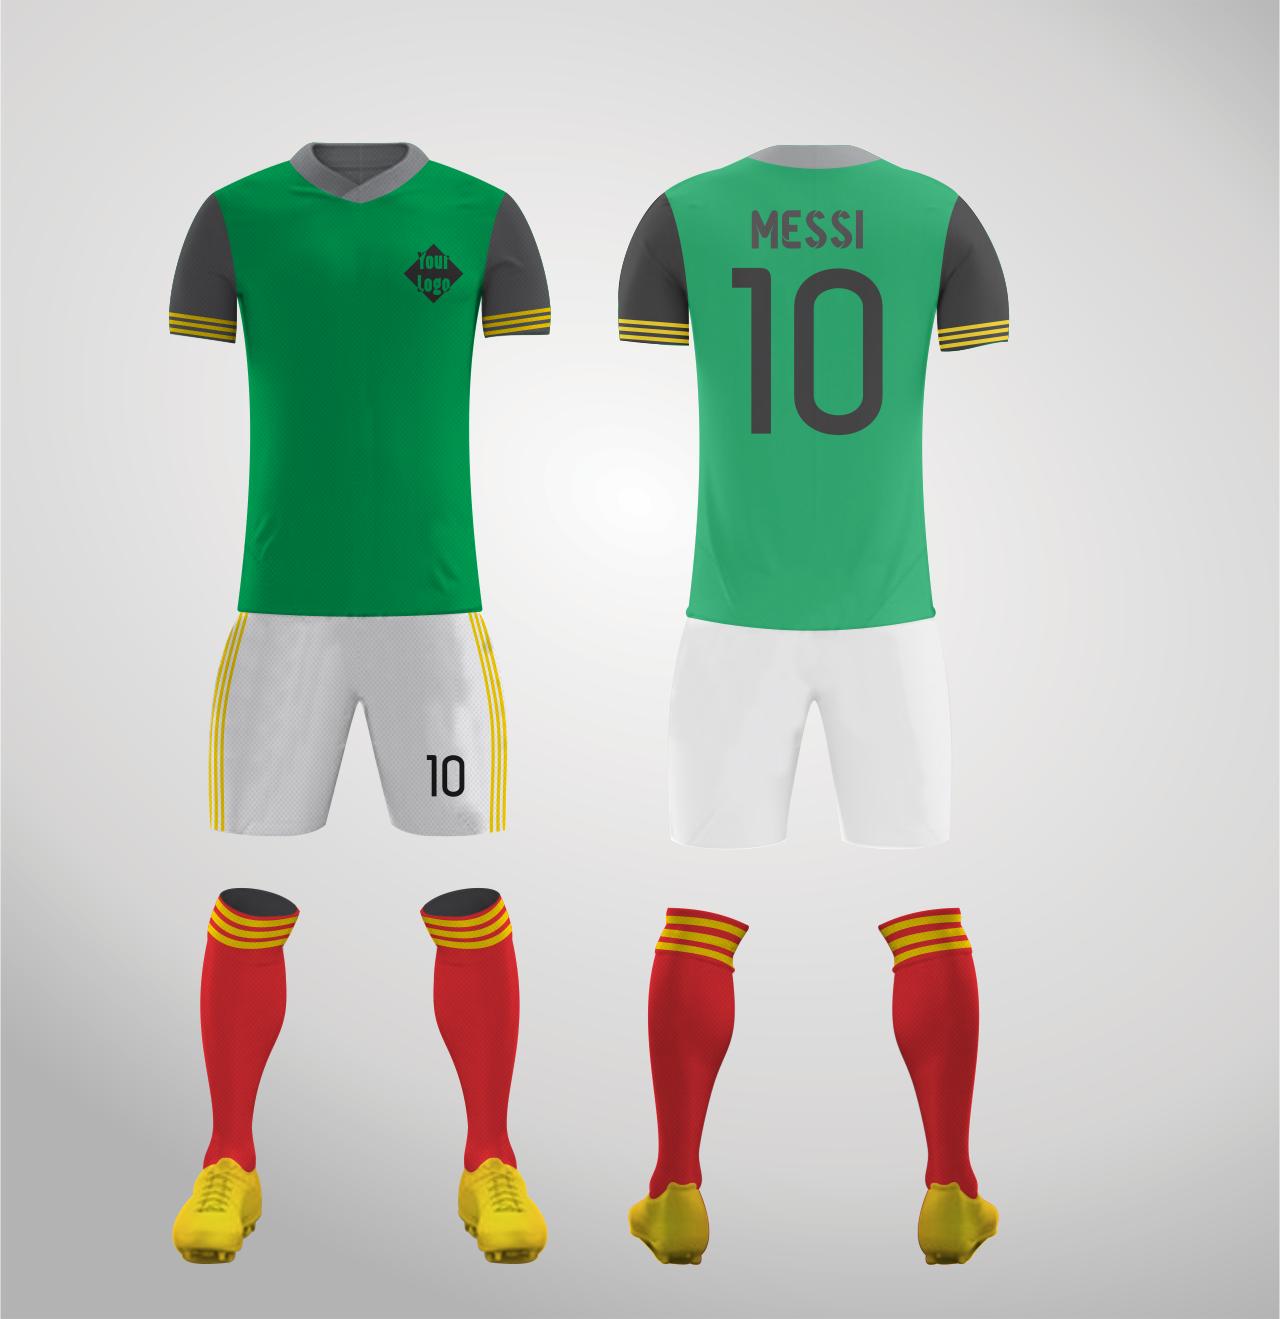 Download Desain Baju Bola Coreldraw - Servyoutube